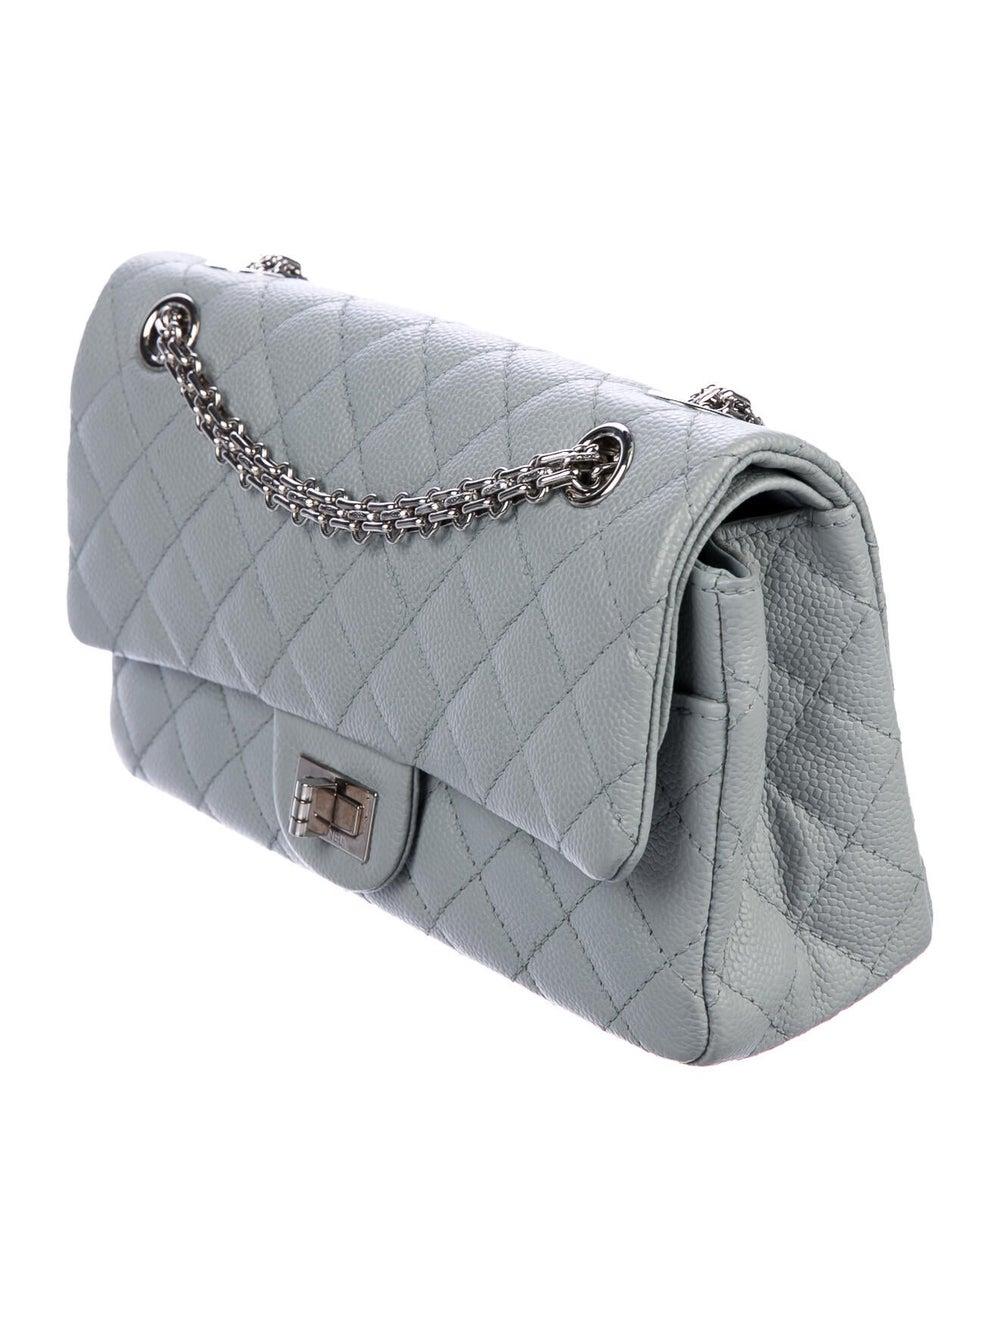 Chanel Reissue 225 Double Flap Bag Blue - image 3